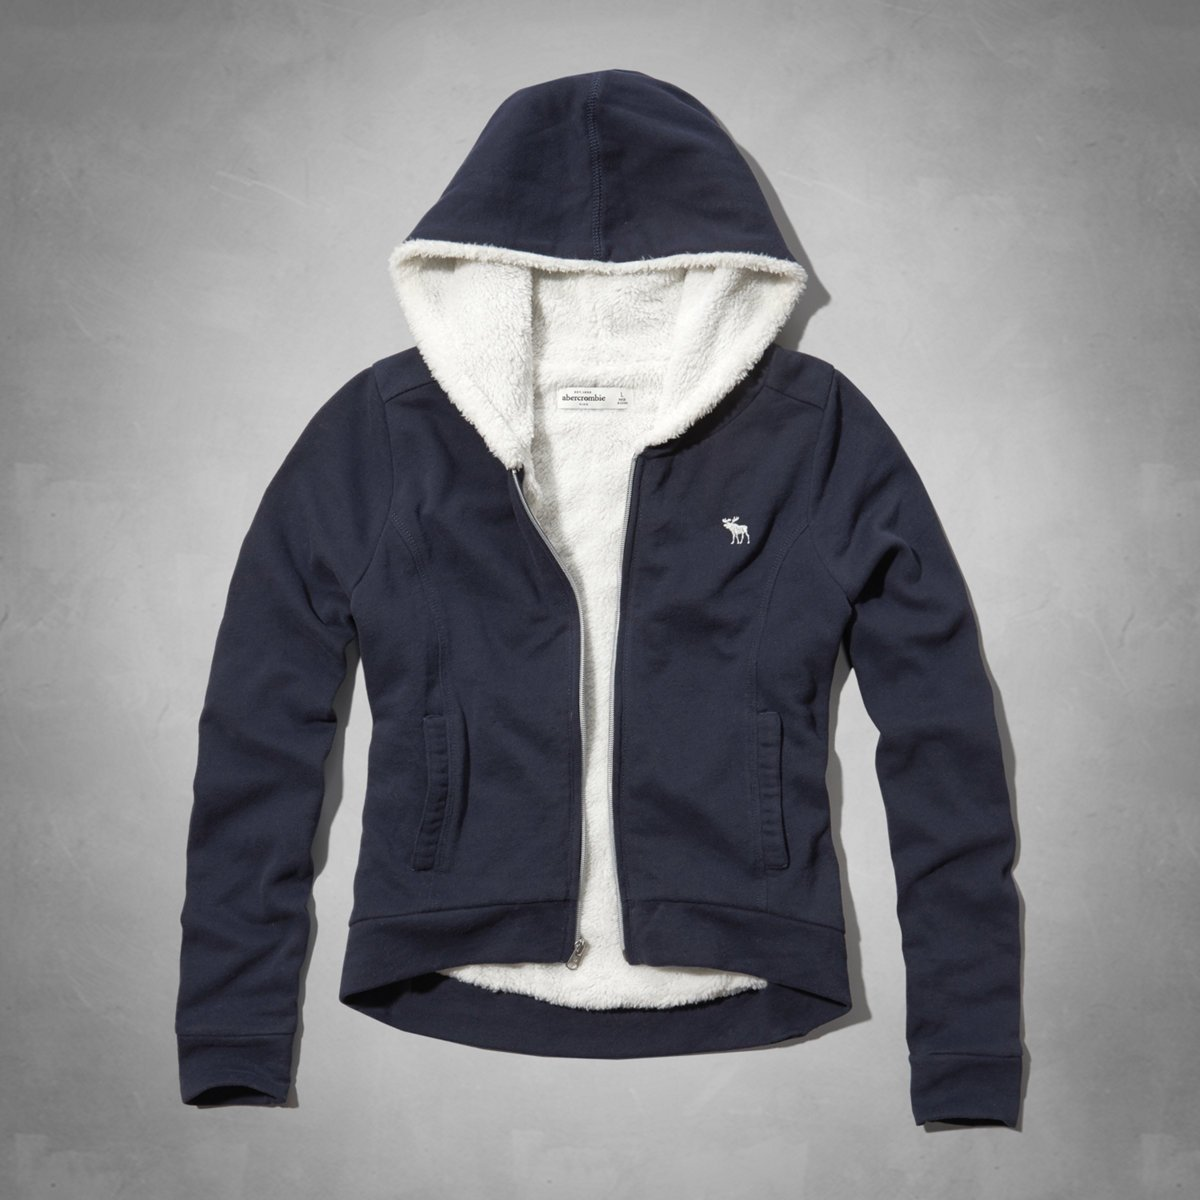 《Cupio》現貨 Abercrombie Kids sherpa lined hoodie熊寶寶毛連帽外套(XL)30